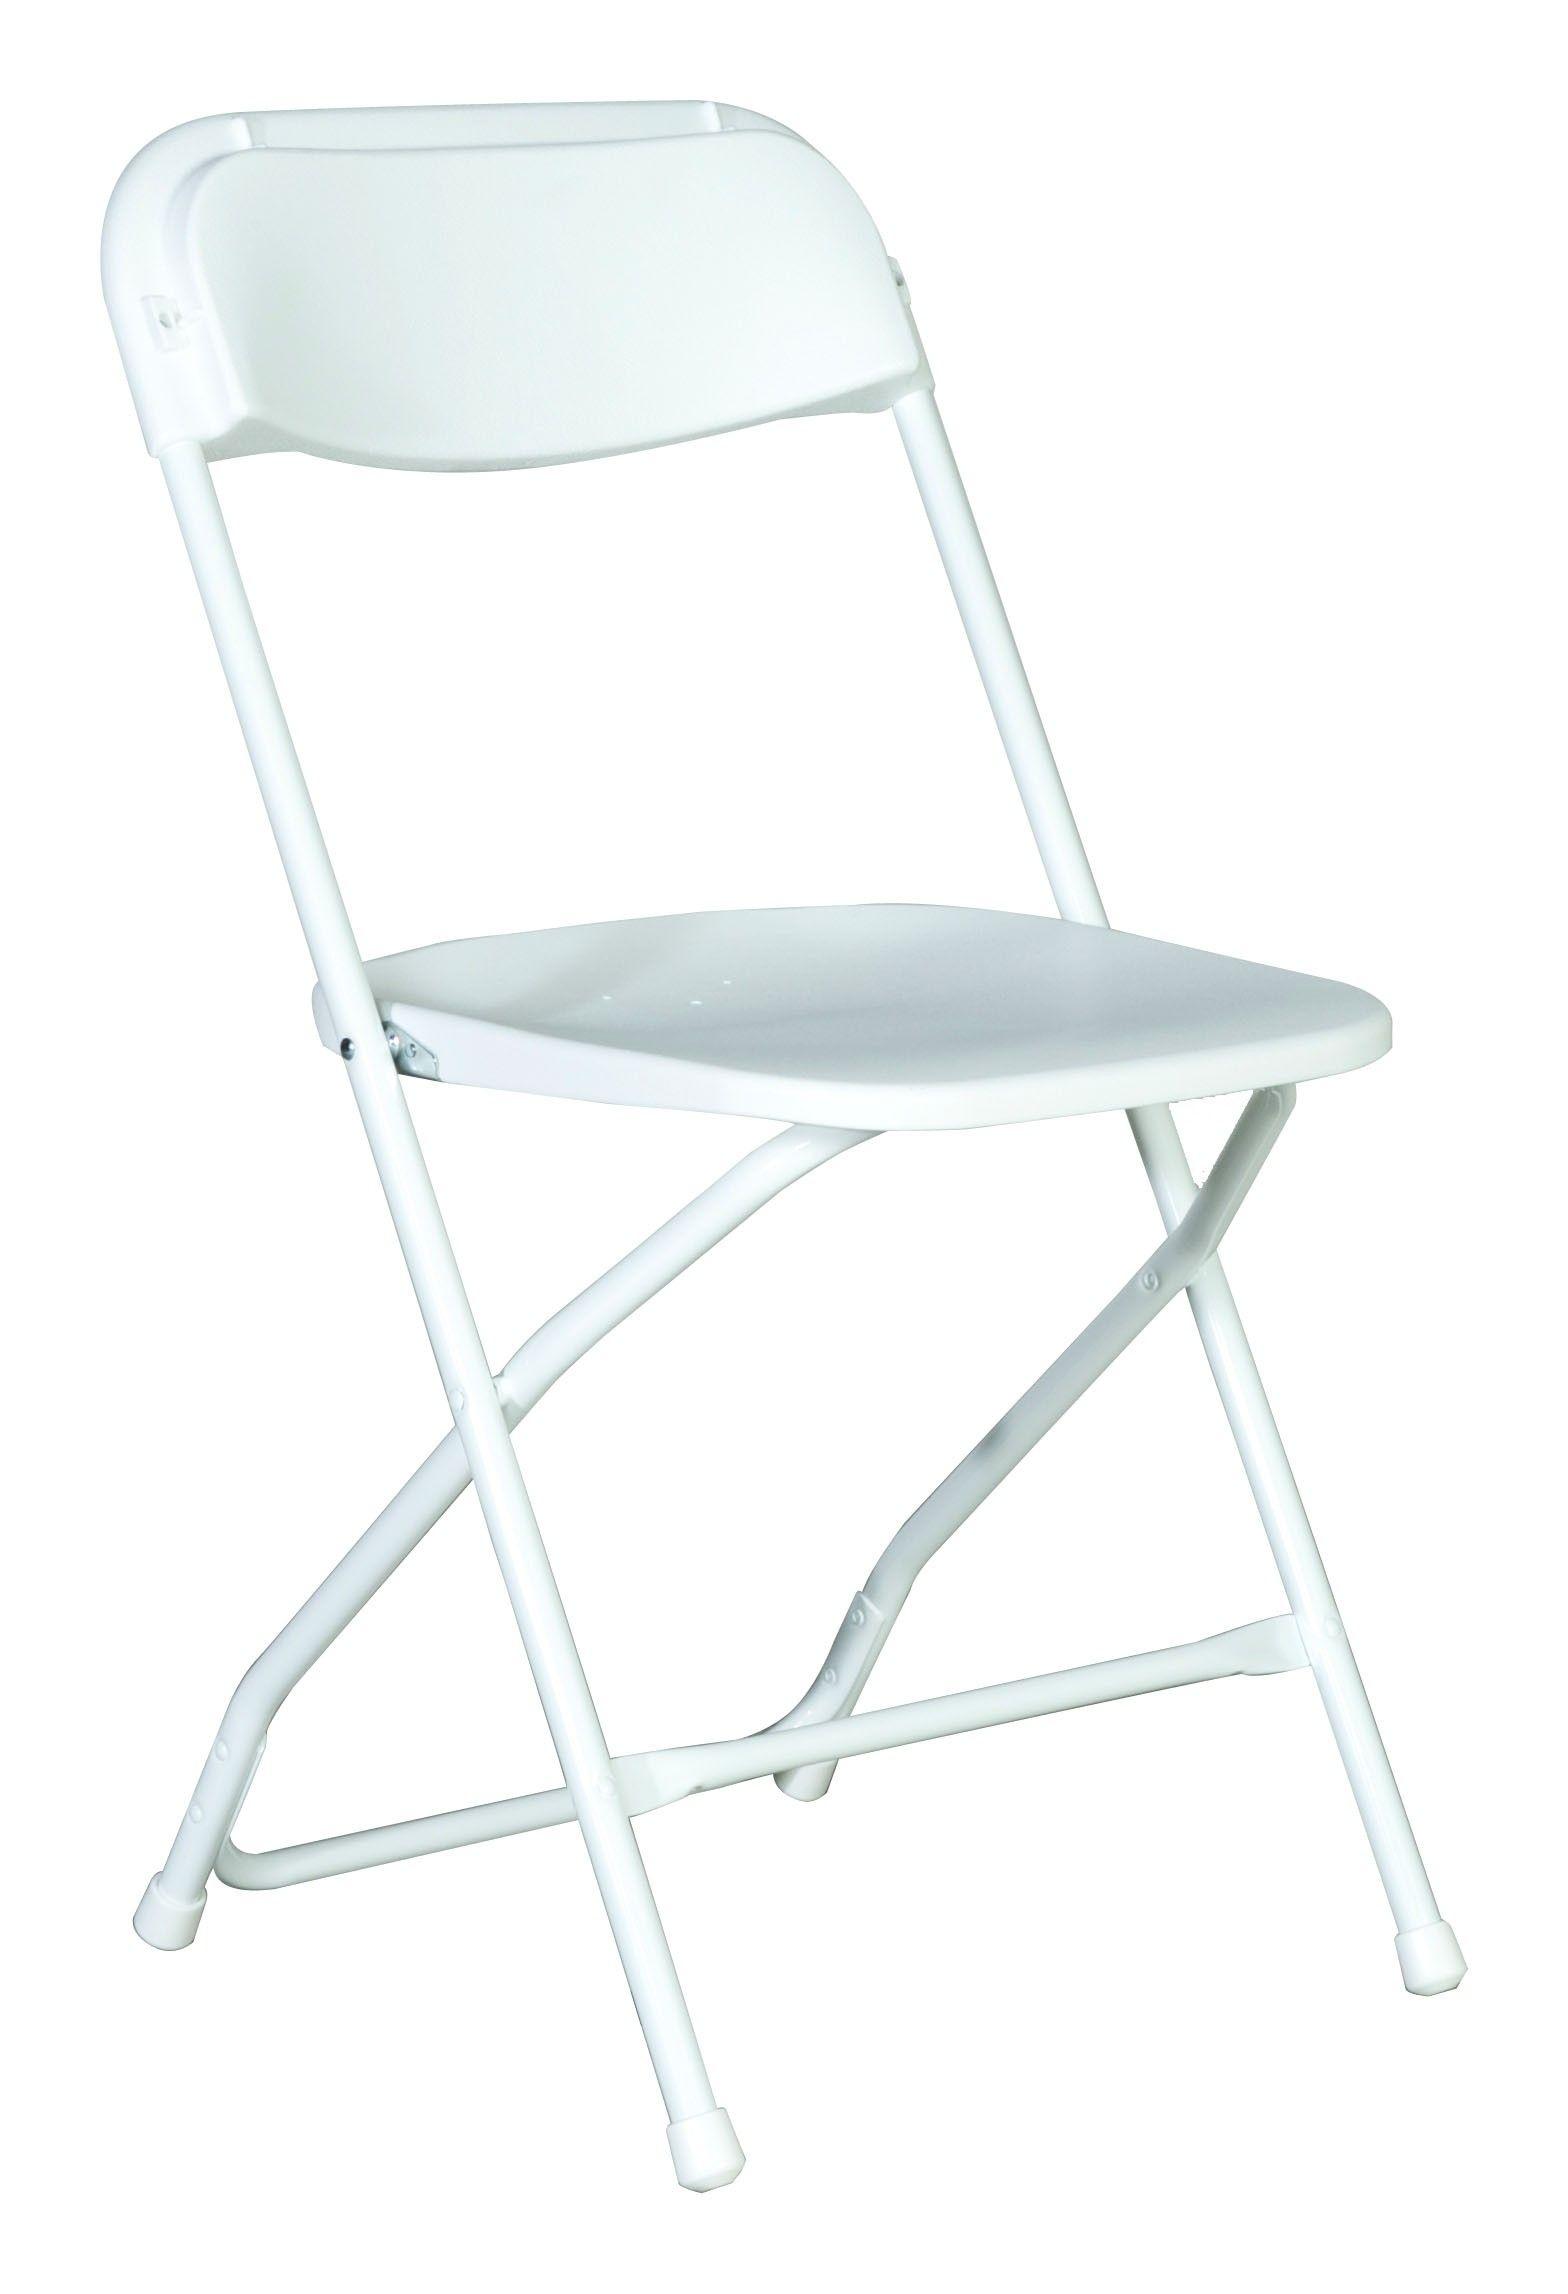 chairs in bulk kids table chair set white plastic folding http jeremyeatonart com